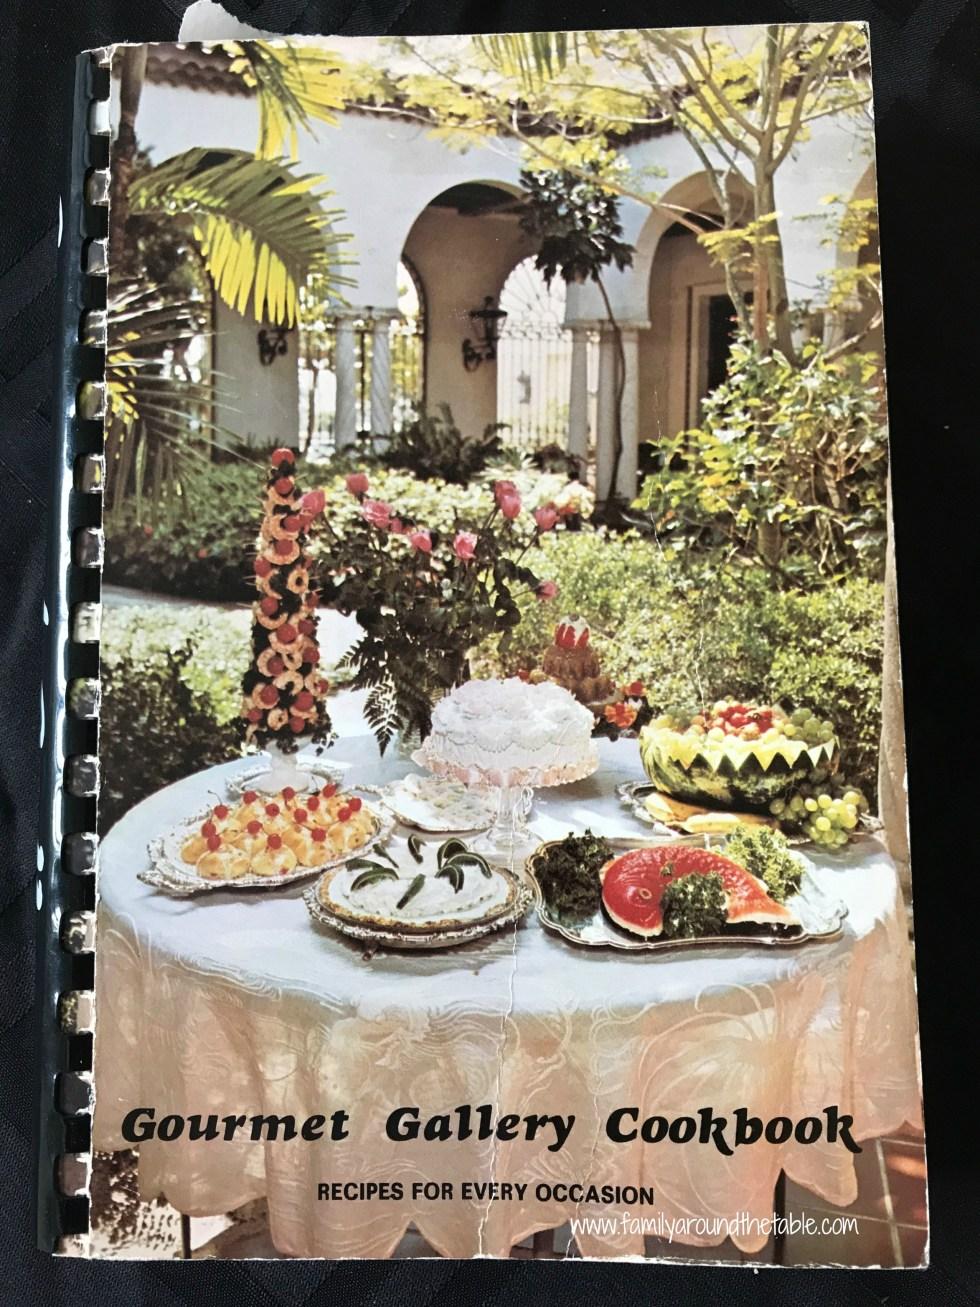 Gourmet Gallery Cookbook from The Museum of Fine Arts, St. Petersburg, FL